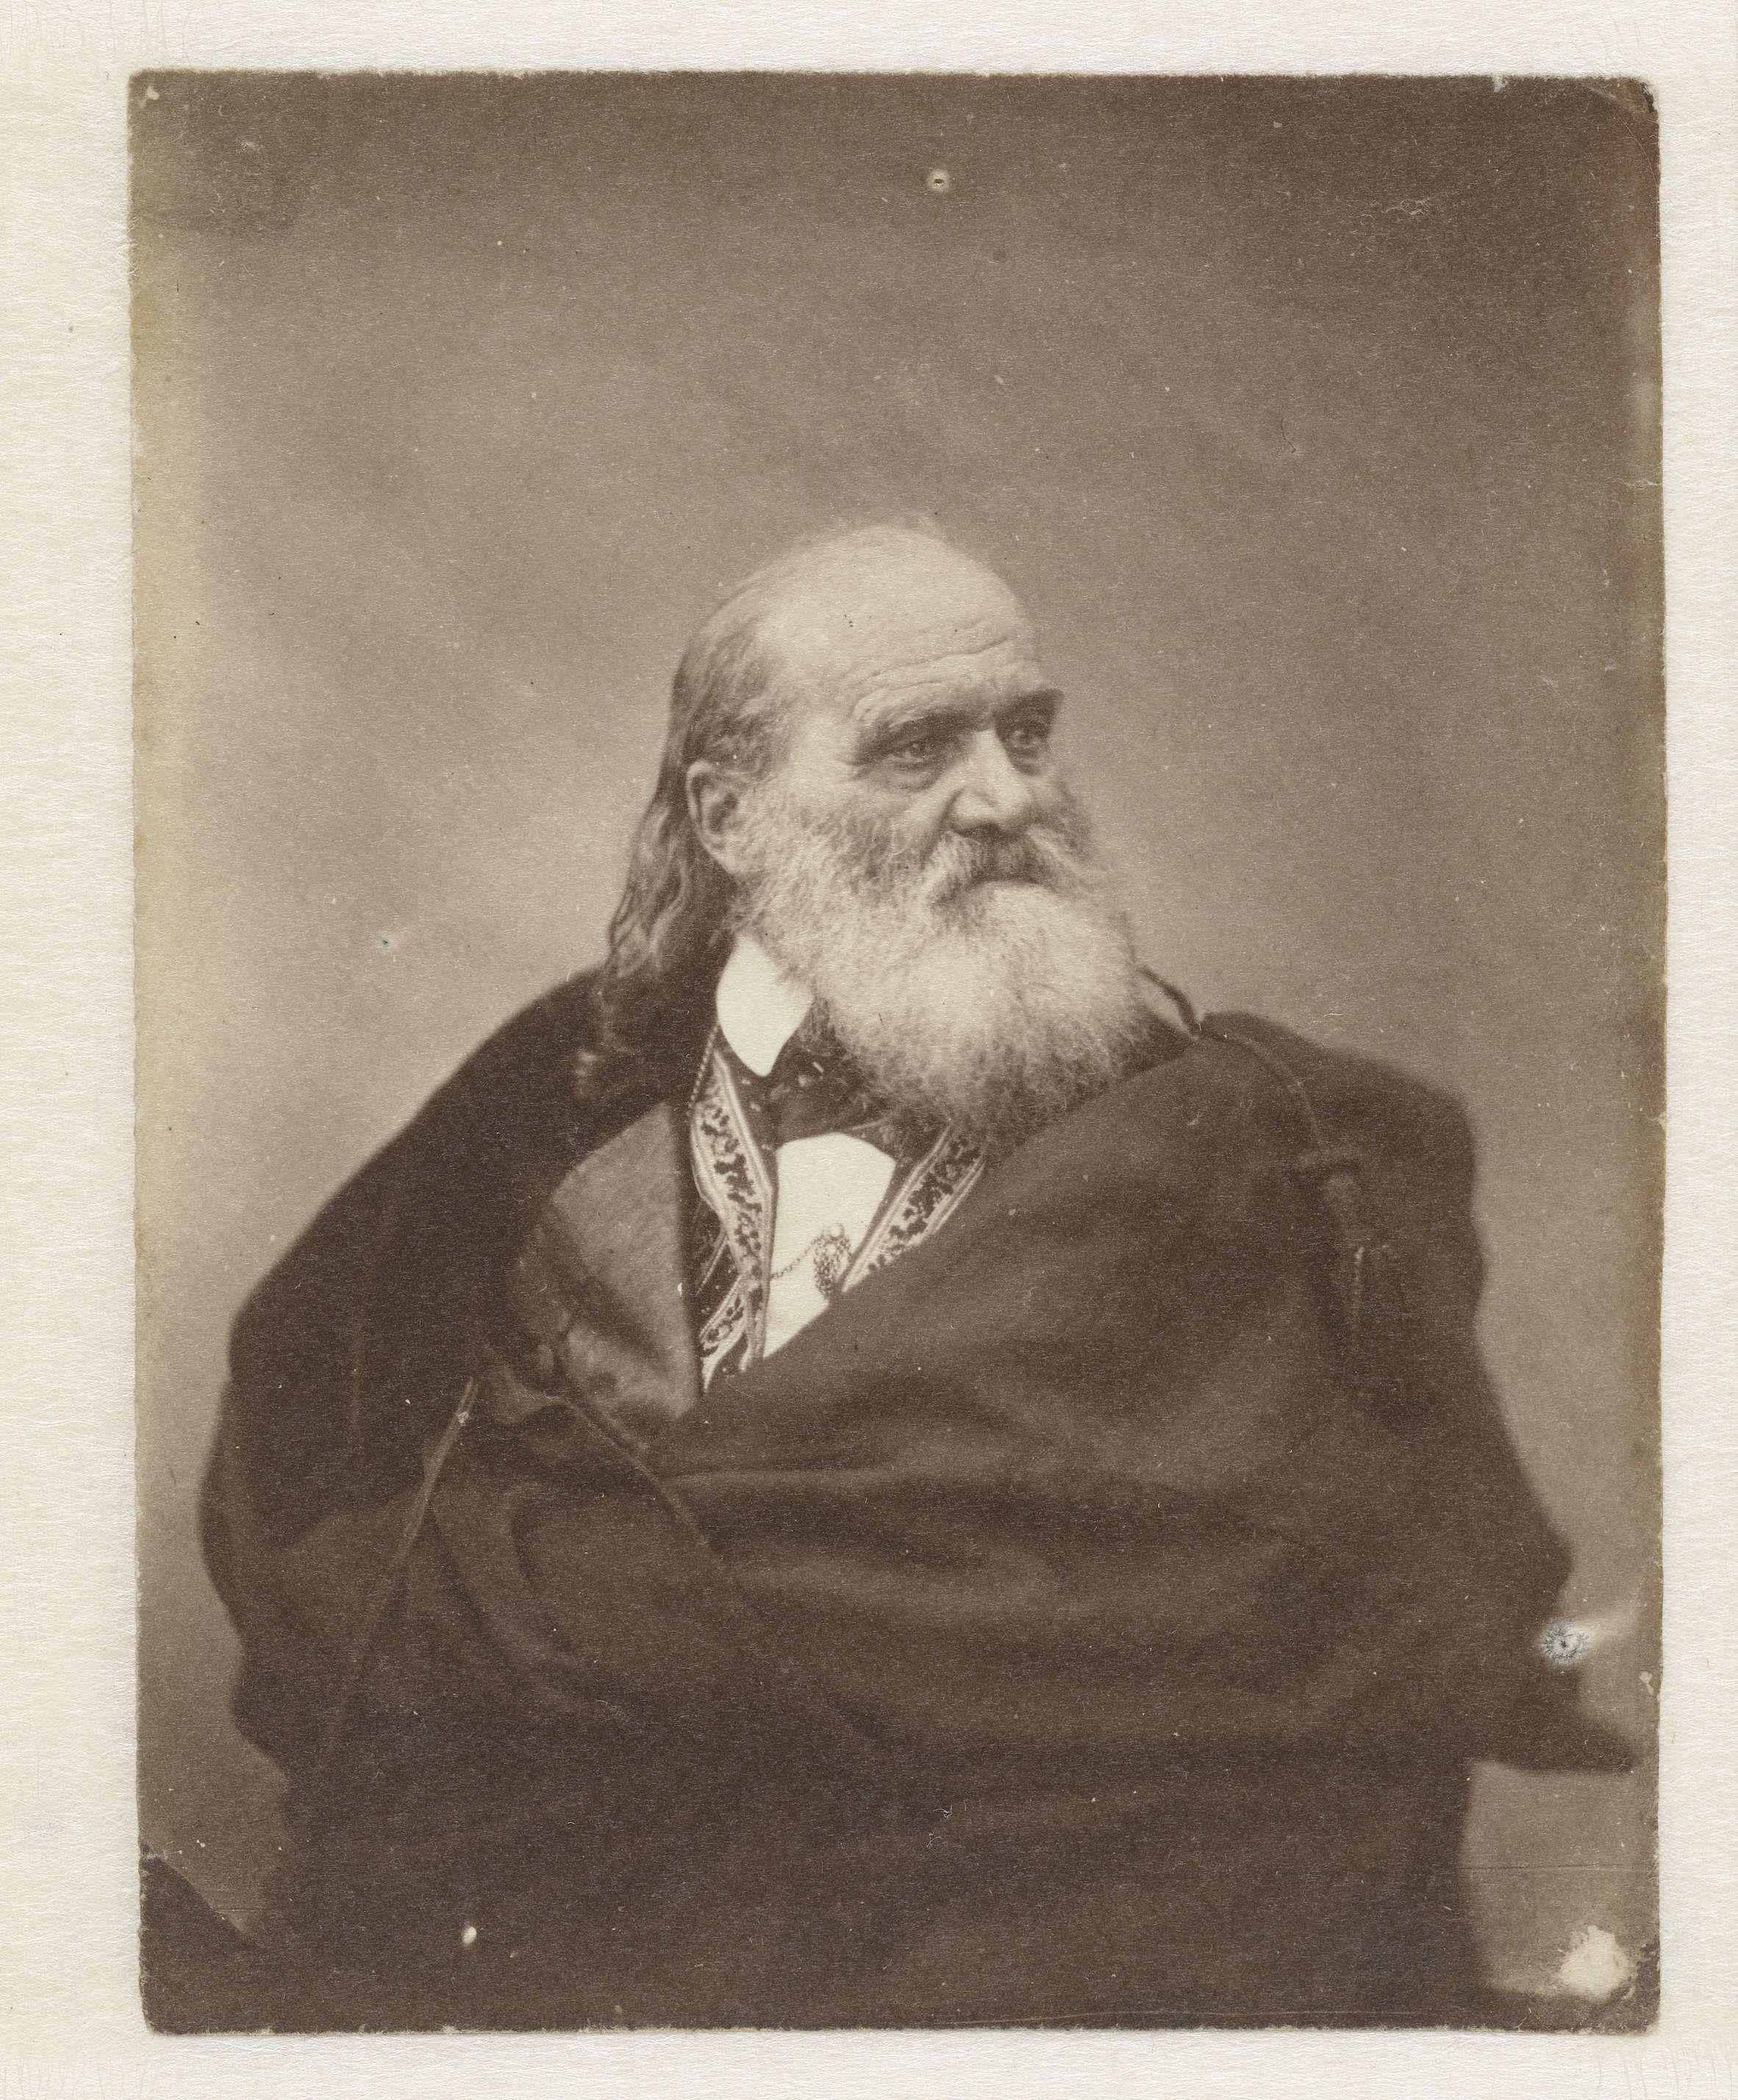 Nicolaas Henneman | Portret van Signor Sentura, Nicolaas Henneman, 1853 |